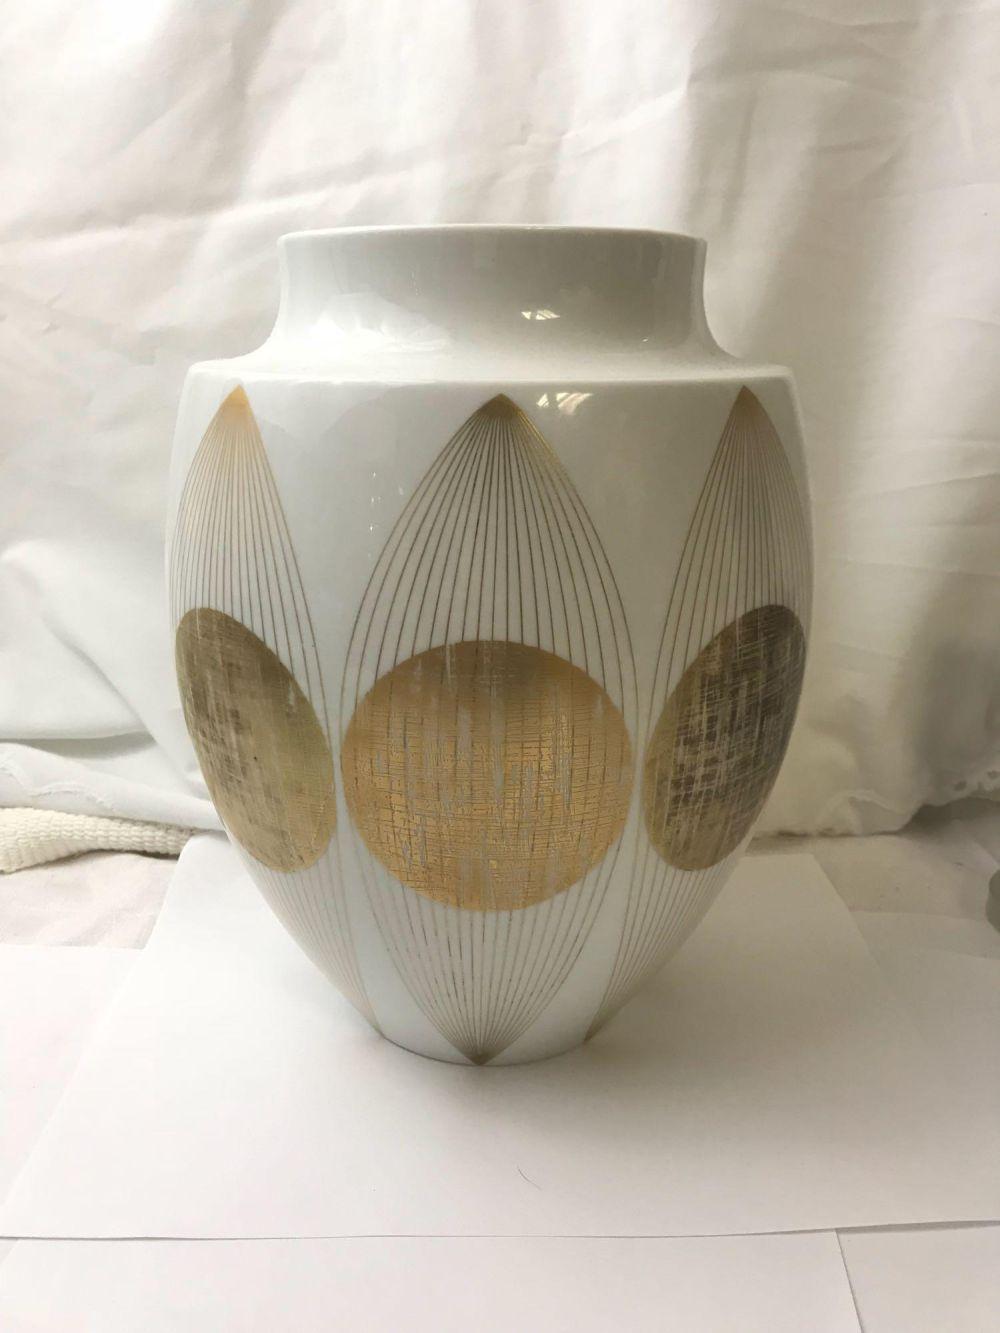 Atomic Age Furstenberg Gold and White Porcelain Vase